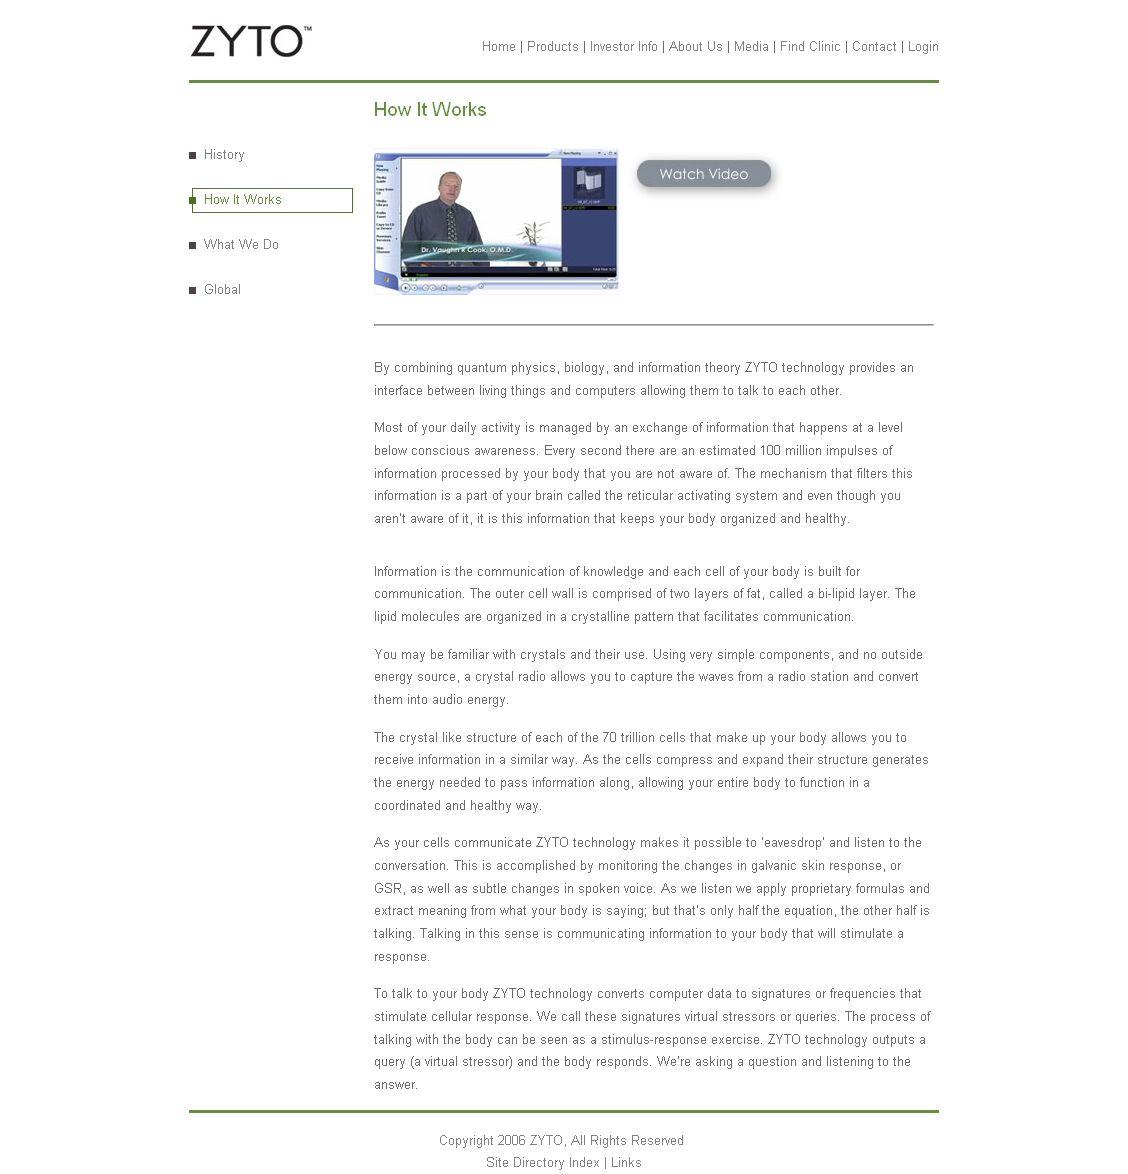 [zyto_about_screen_shot.jpg]